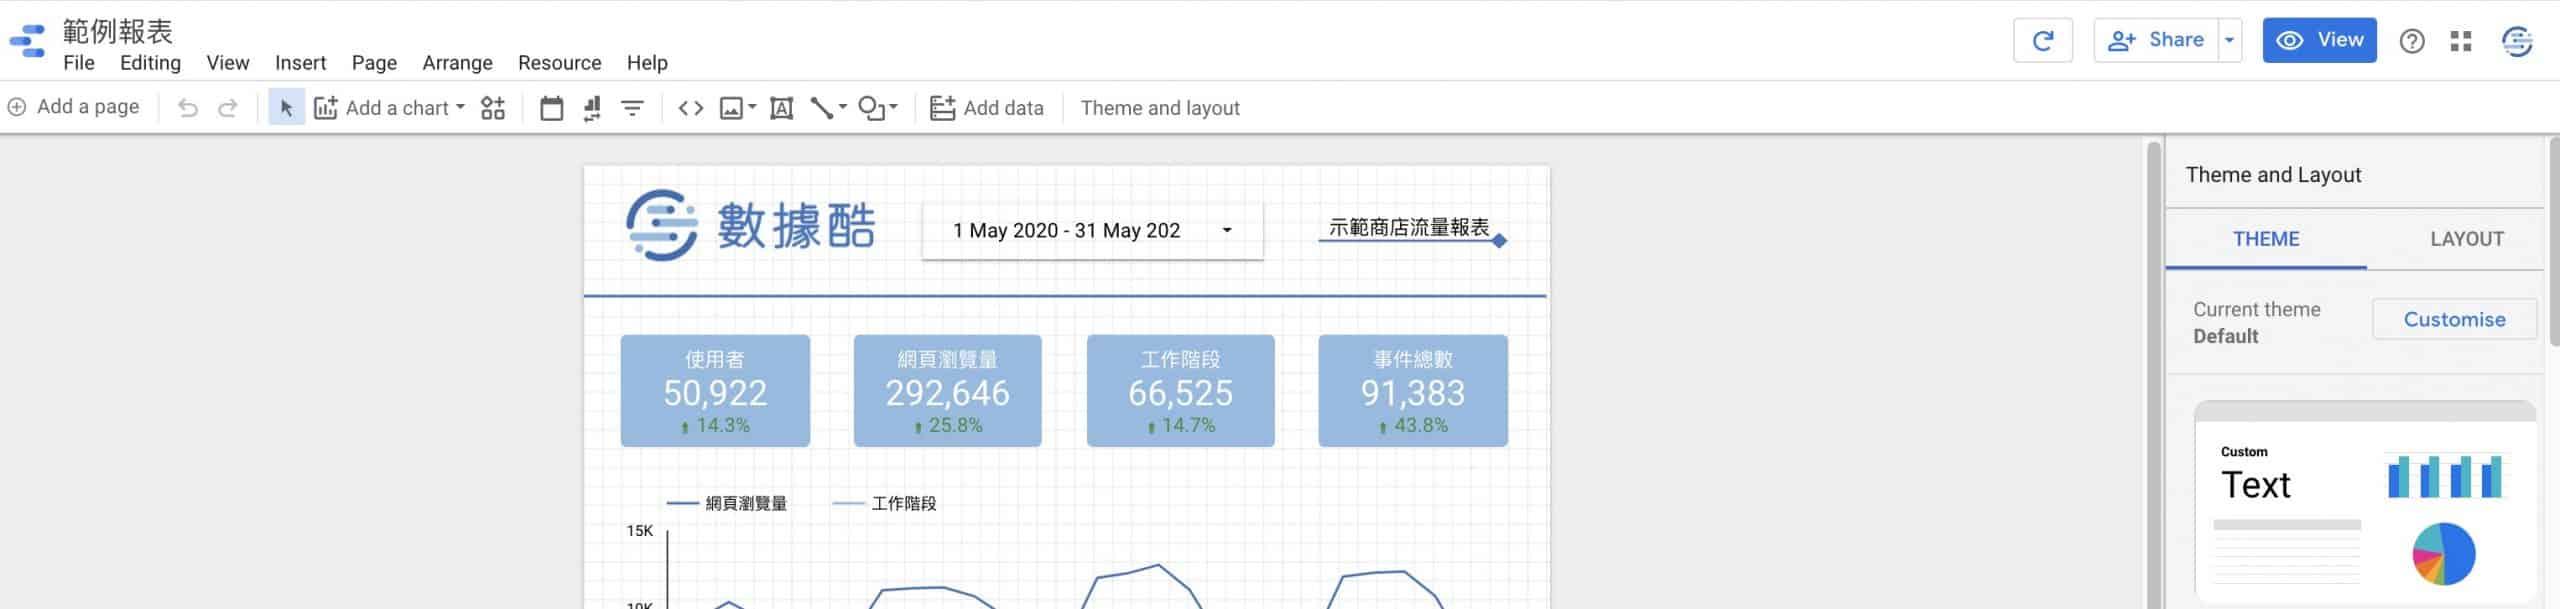 改變 Data studio 頁面 UI 語言